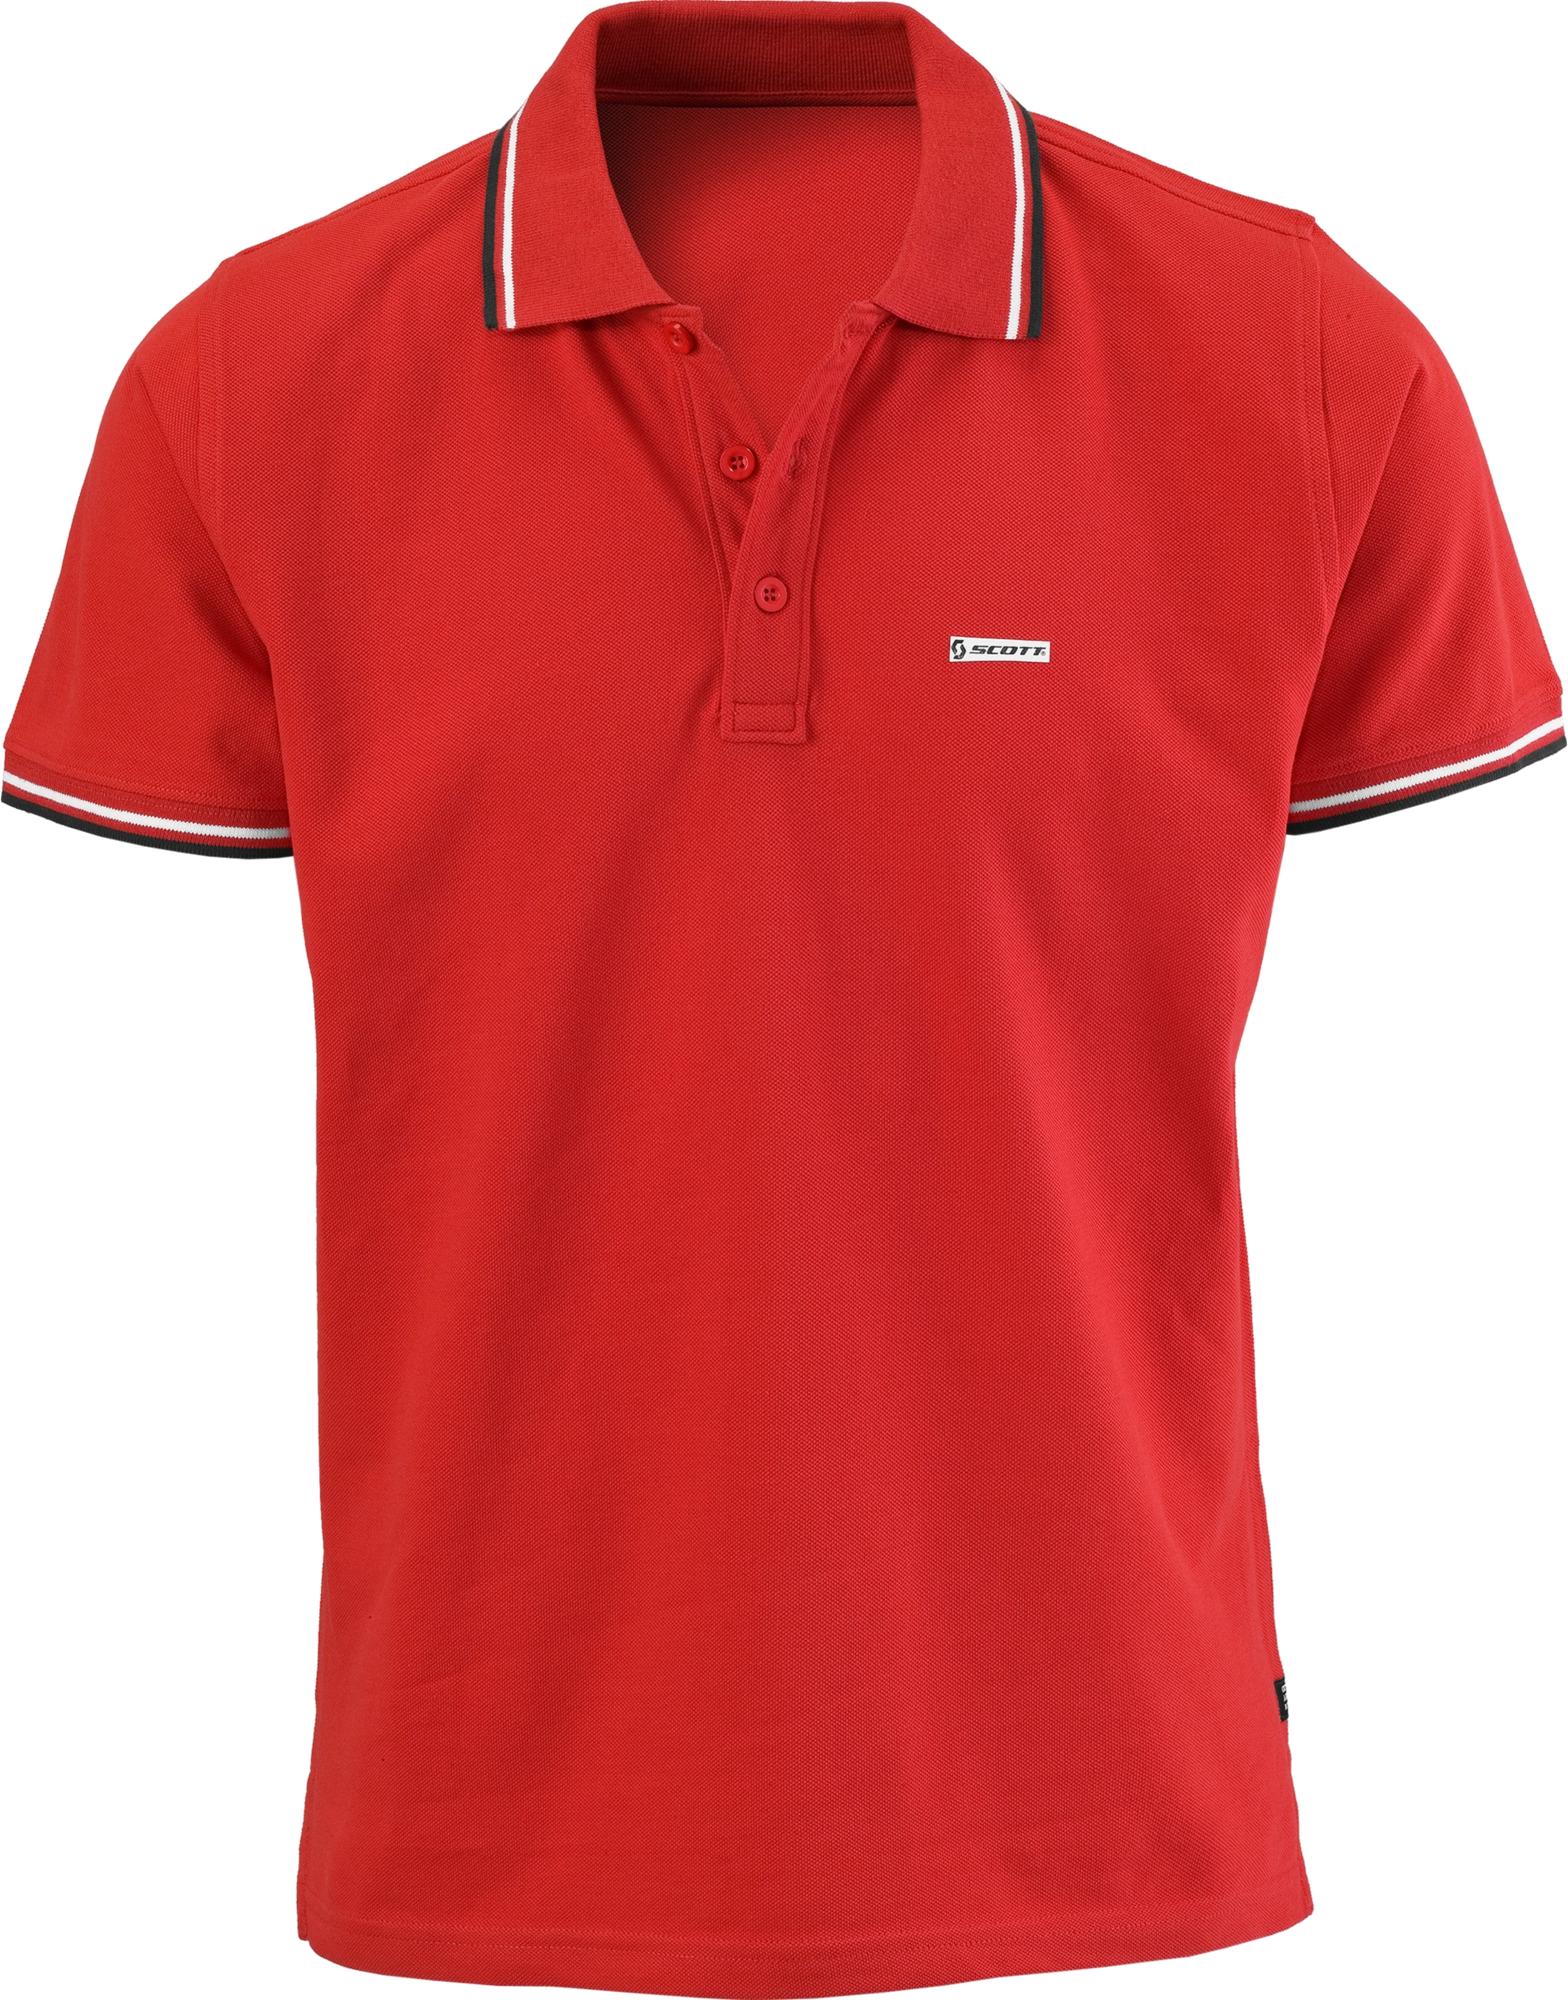 Jersey clipart long sleeve, Jersey long sleeve Transparent.